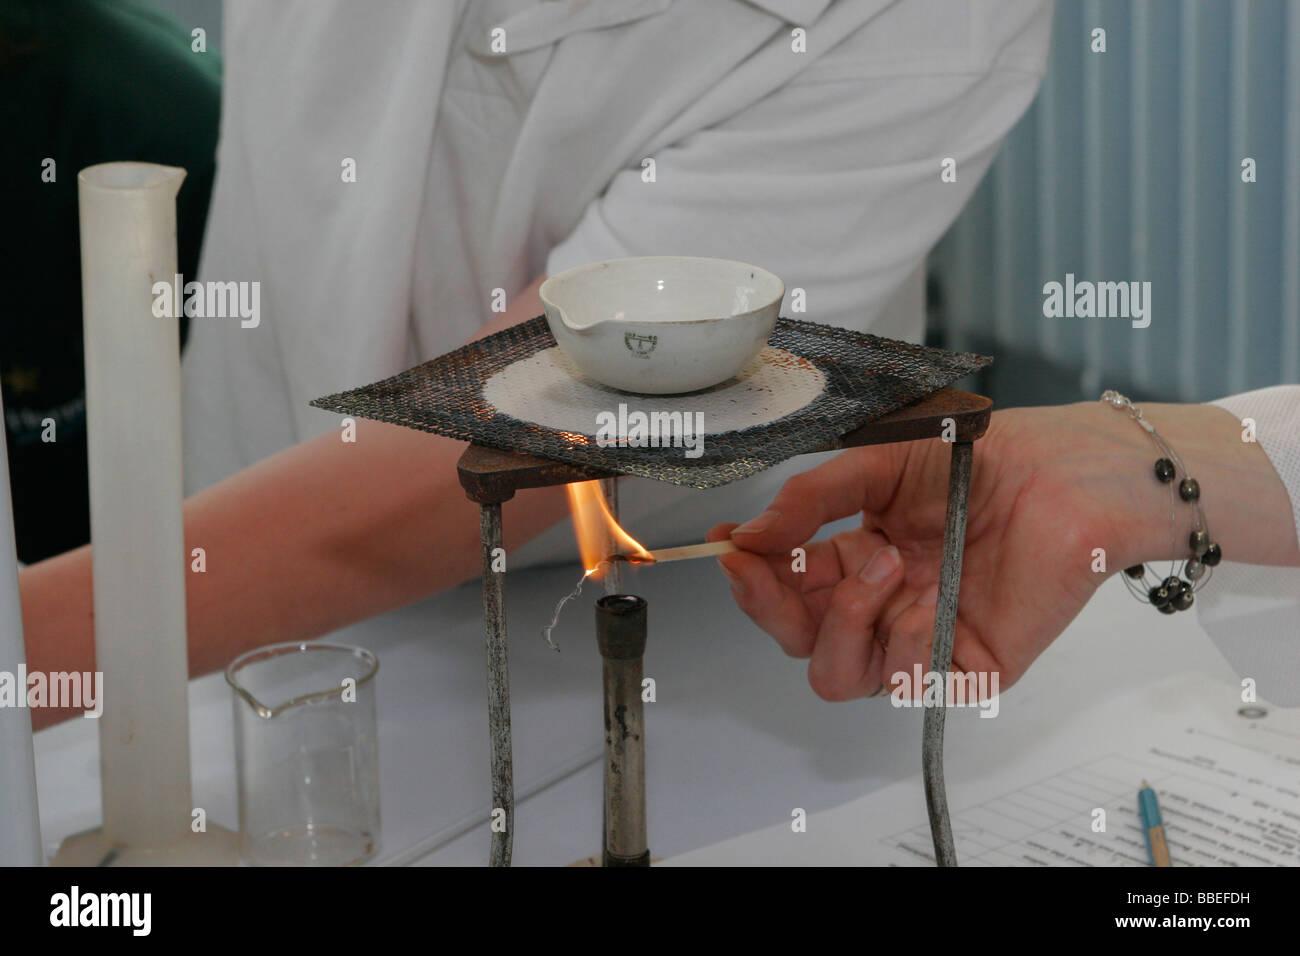 CHILDREN Education Secondary School Teacher lighting Bunsen burner used for food technology experiment measuring - Stock Image